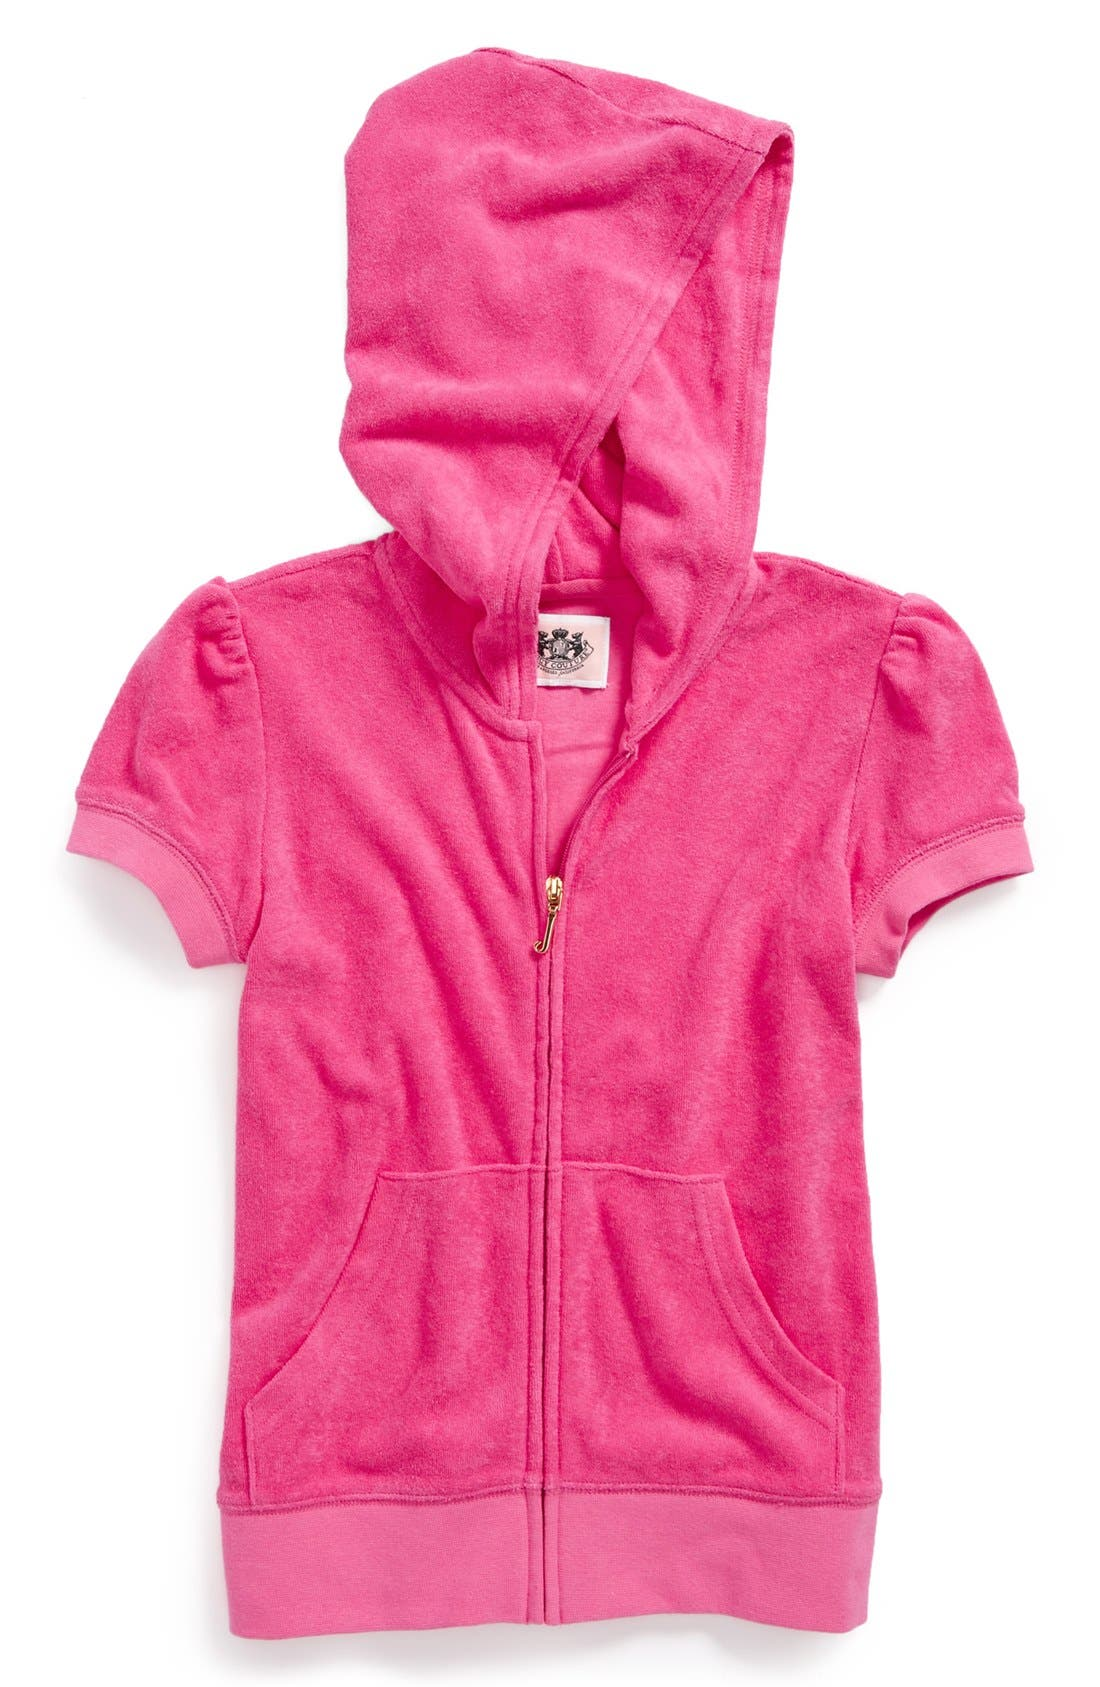 Alternate Image 1 Selected - Juicy Couture Short Sleeve Hoodie (Toddler Girls, Little Girls & Big Girls)